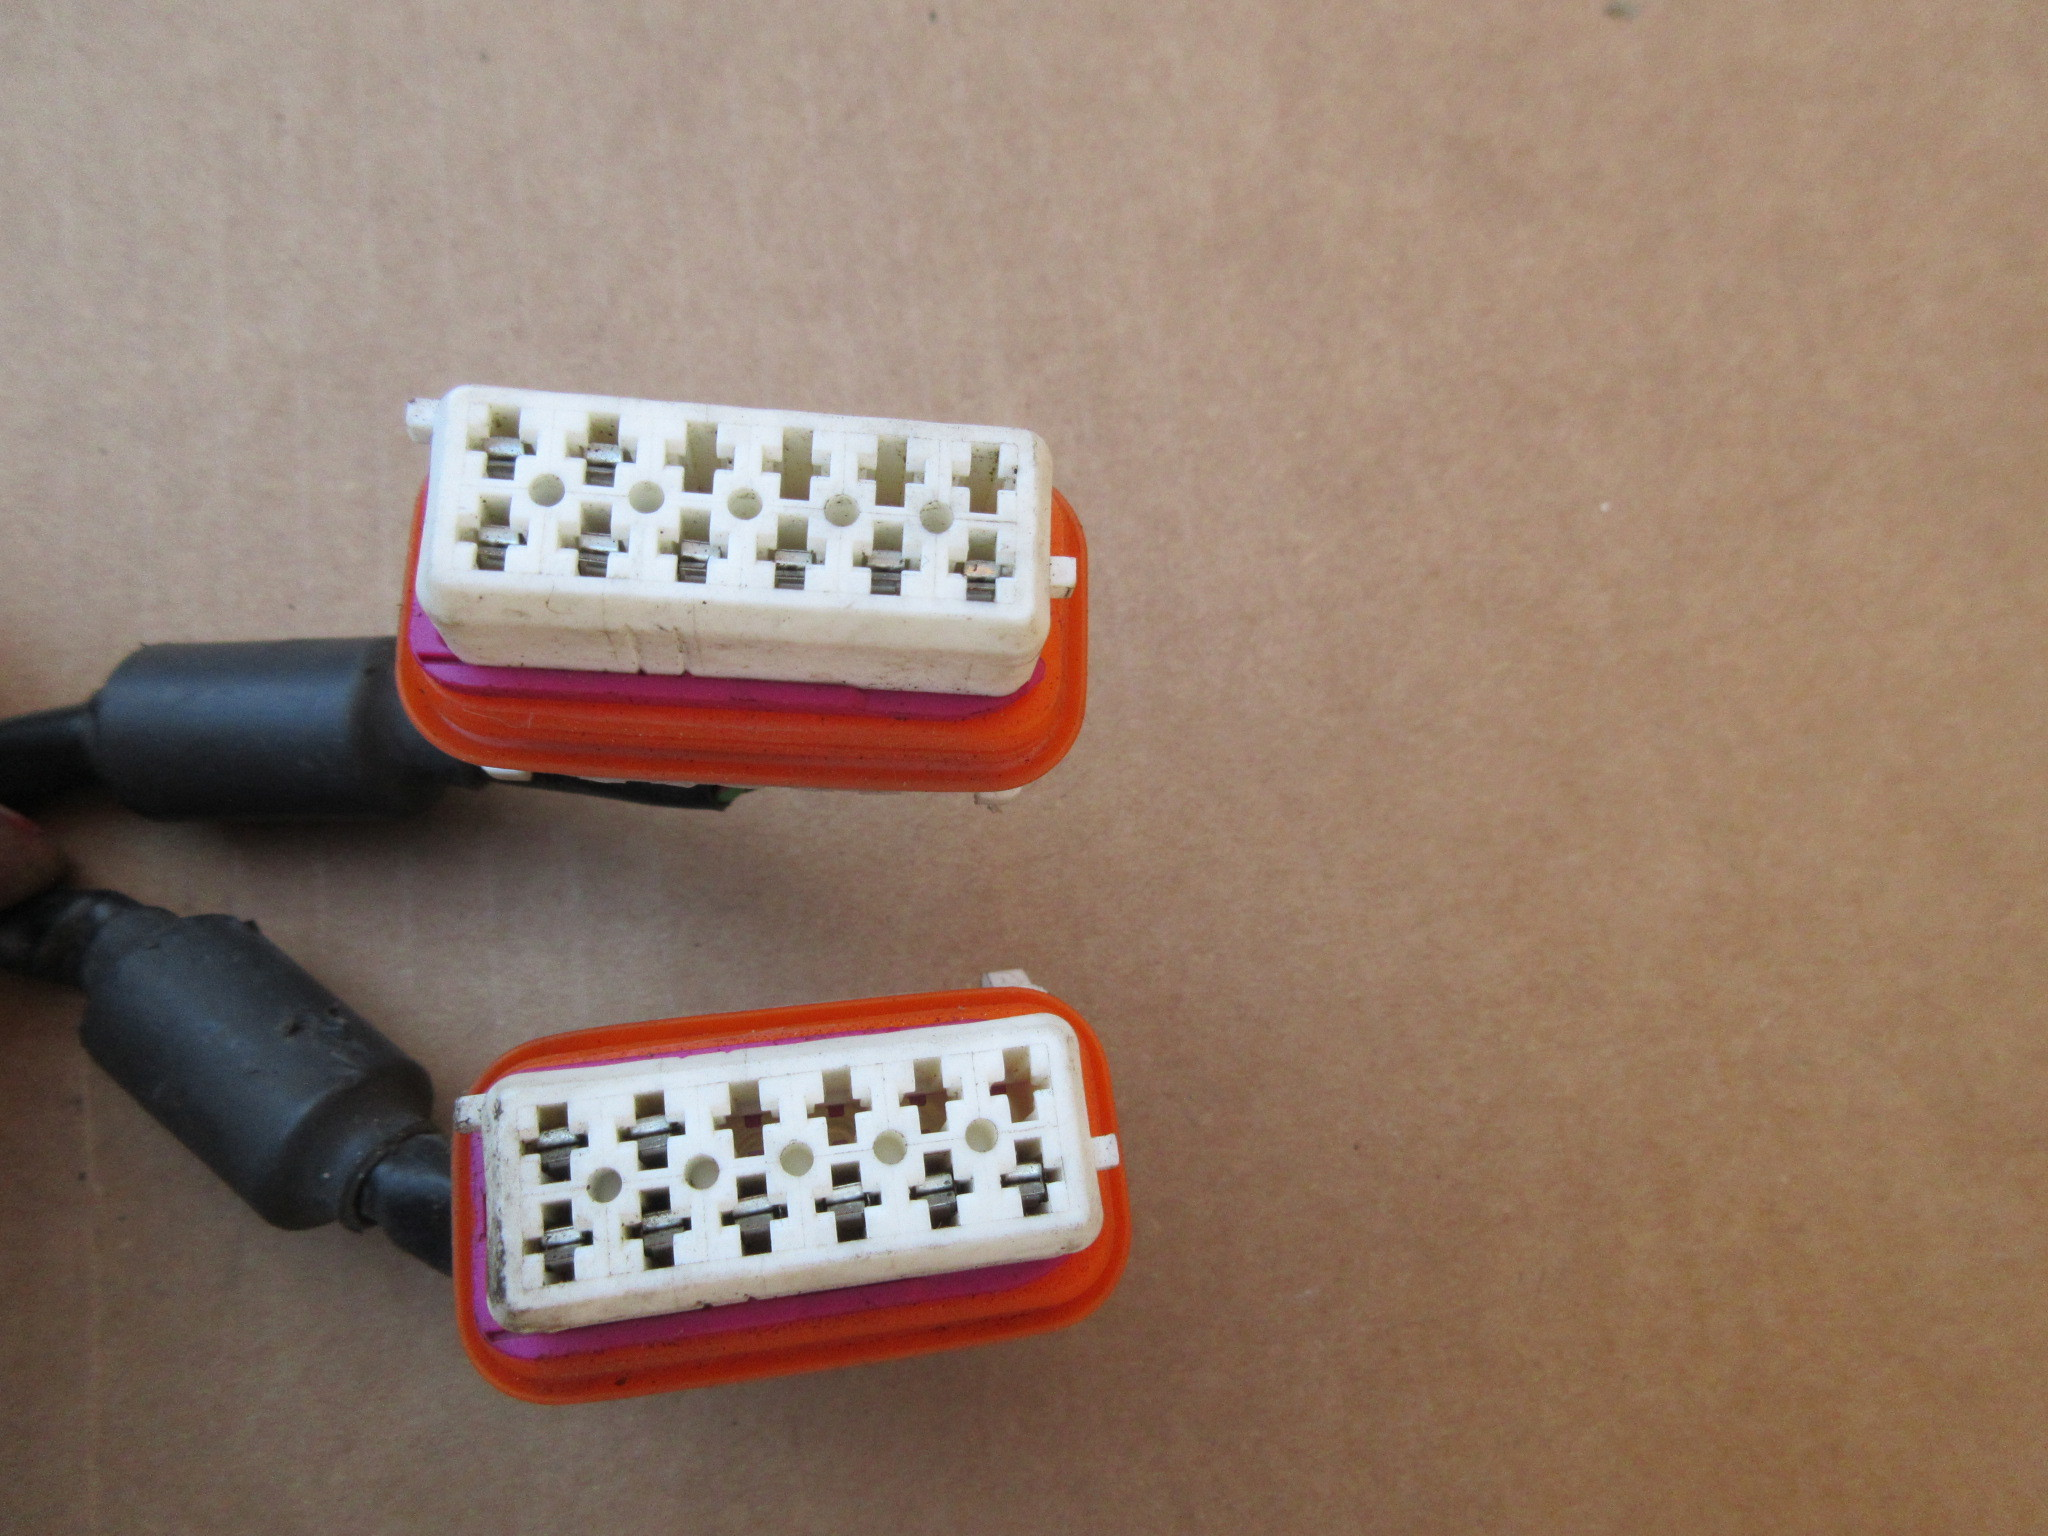 ... 07 Porsche 911 Turbo 997 #1031 Front Headlight Wire Wiring Harness  997612551Z2 ...